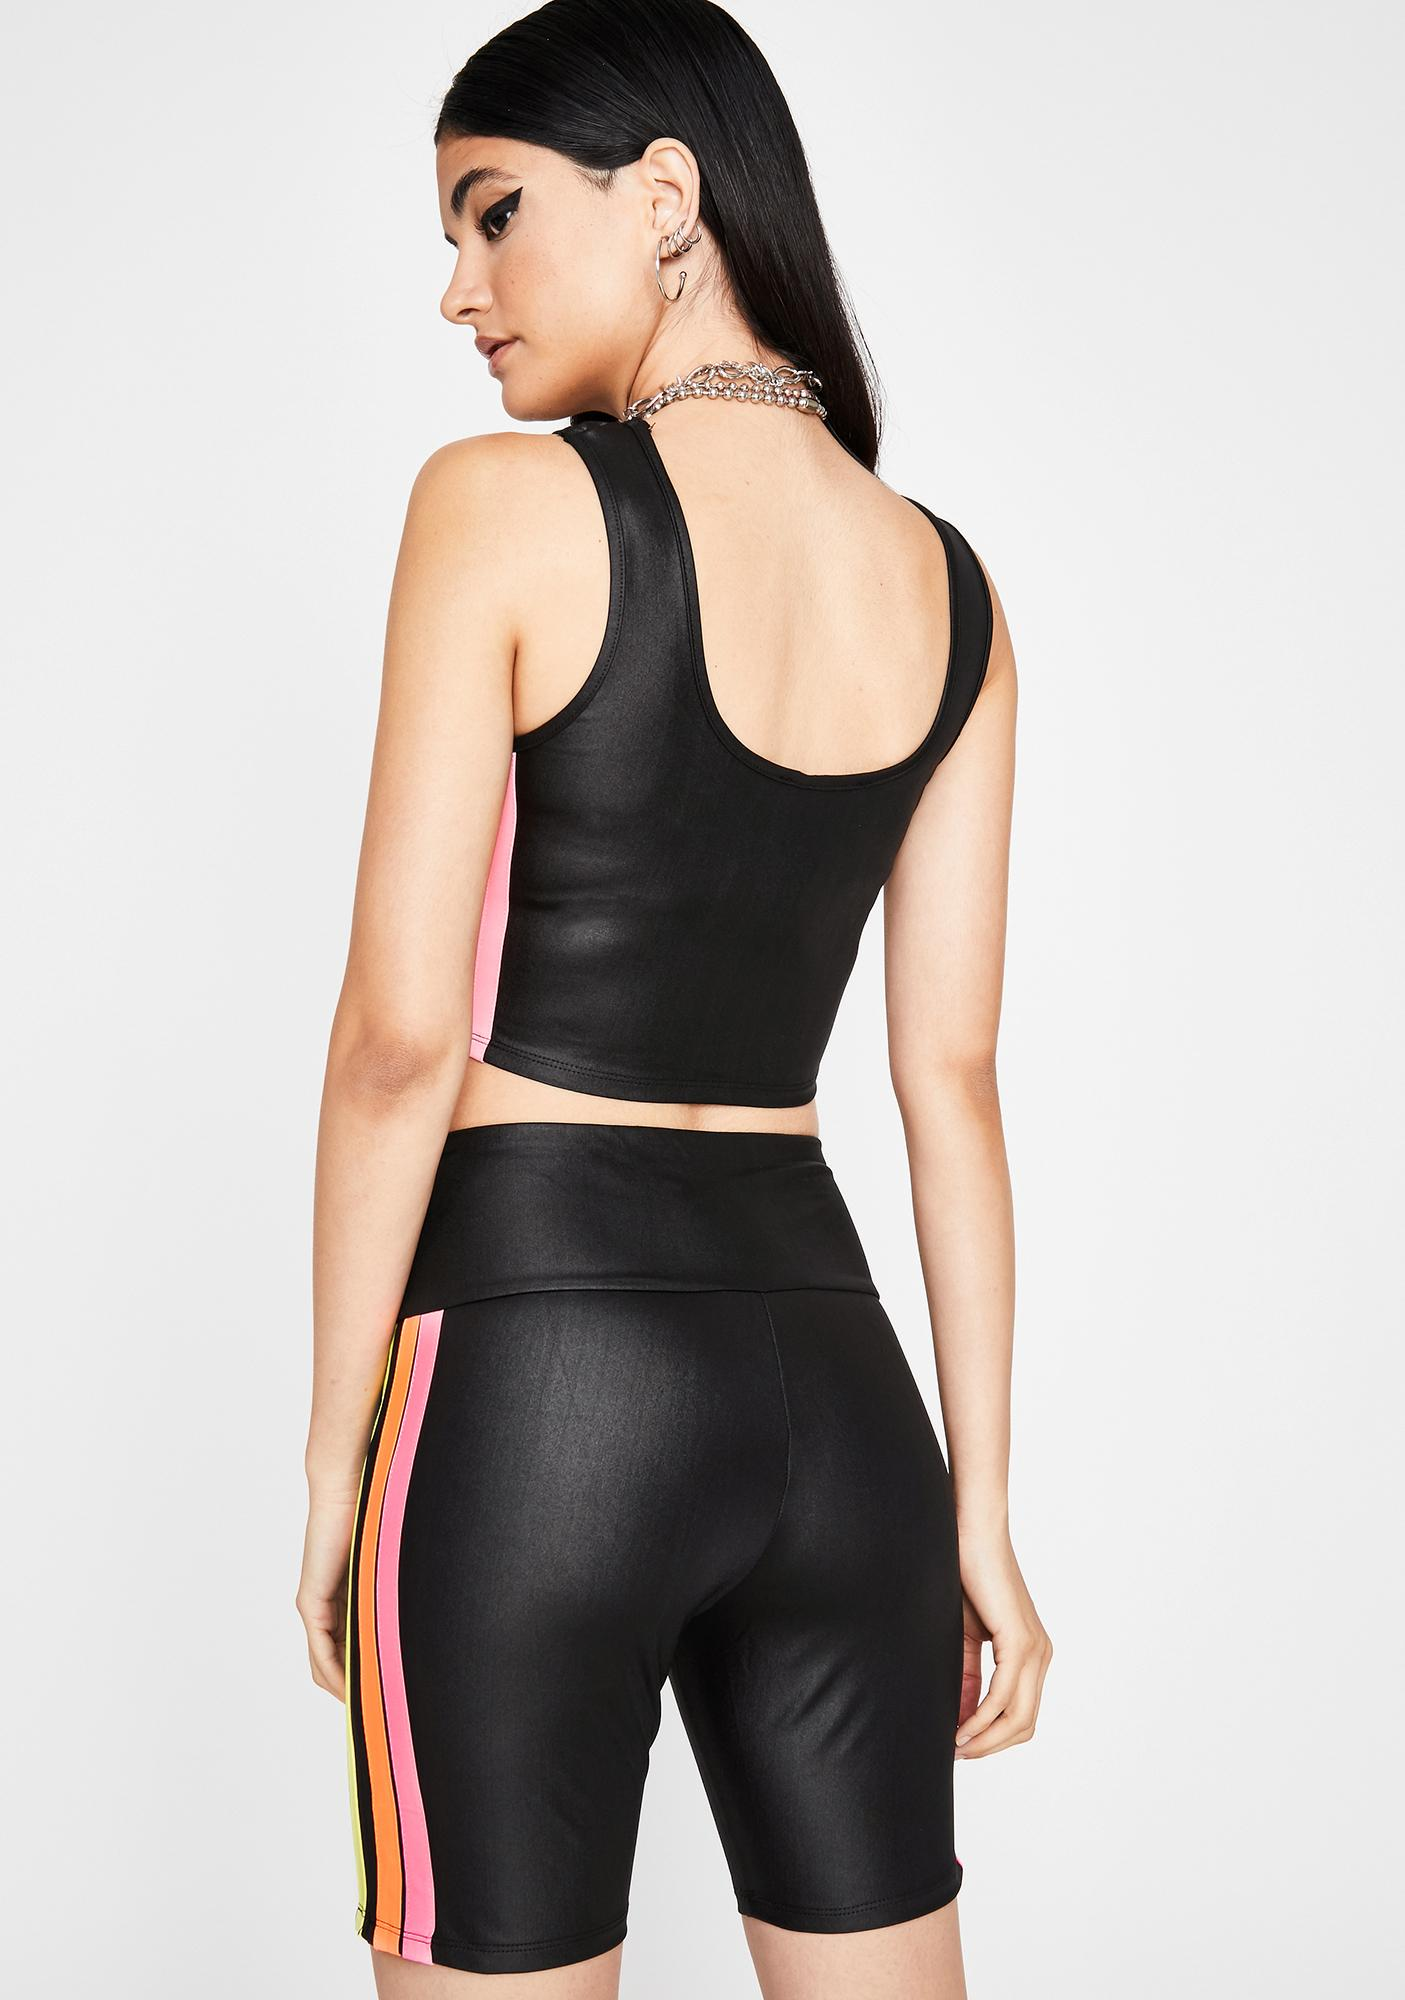 Trailblazin' Bish Shorts Set